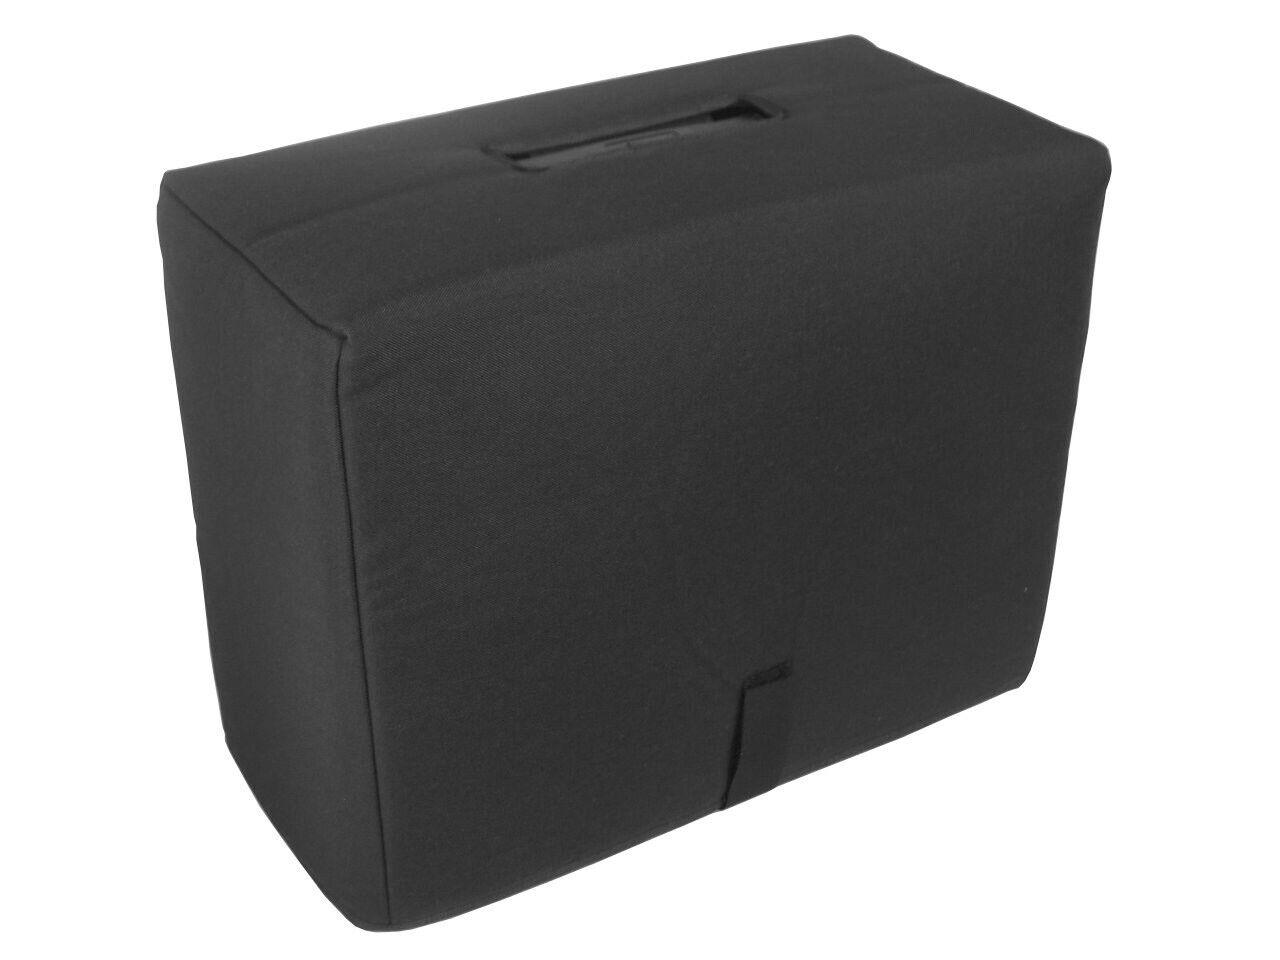 Dime Amplification D100C 2x12 Combo Amp Cover, Schwarz, Padding, Tuki (dime003p)